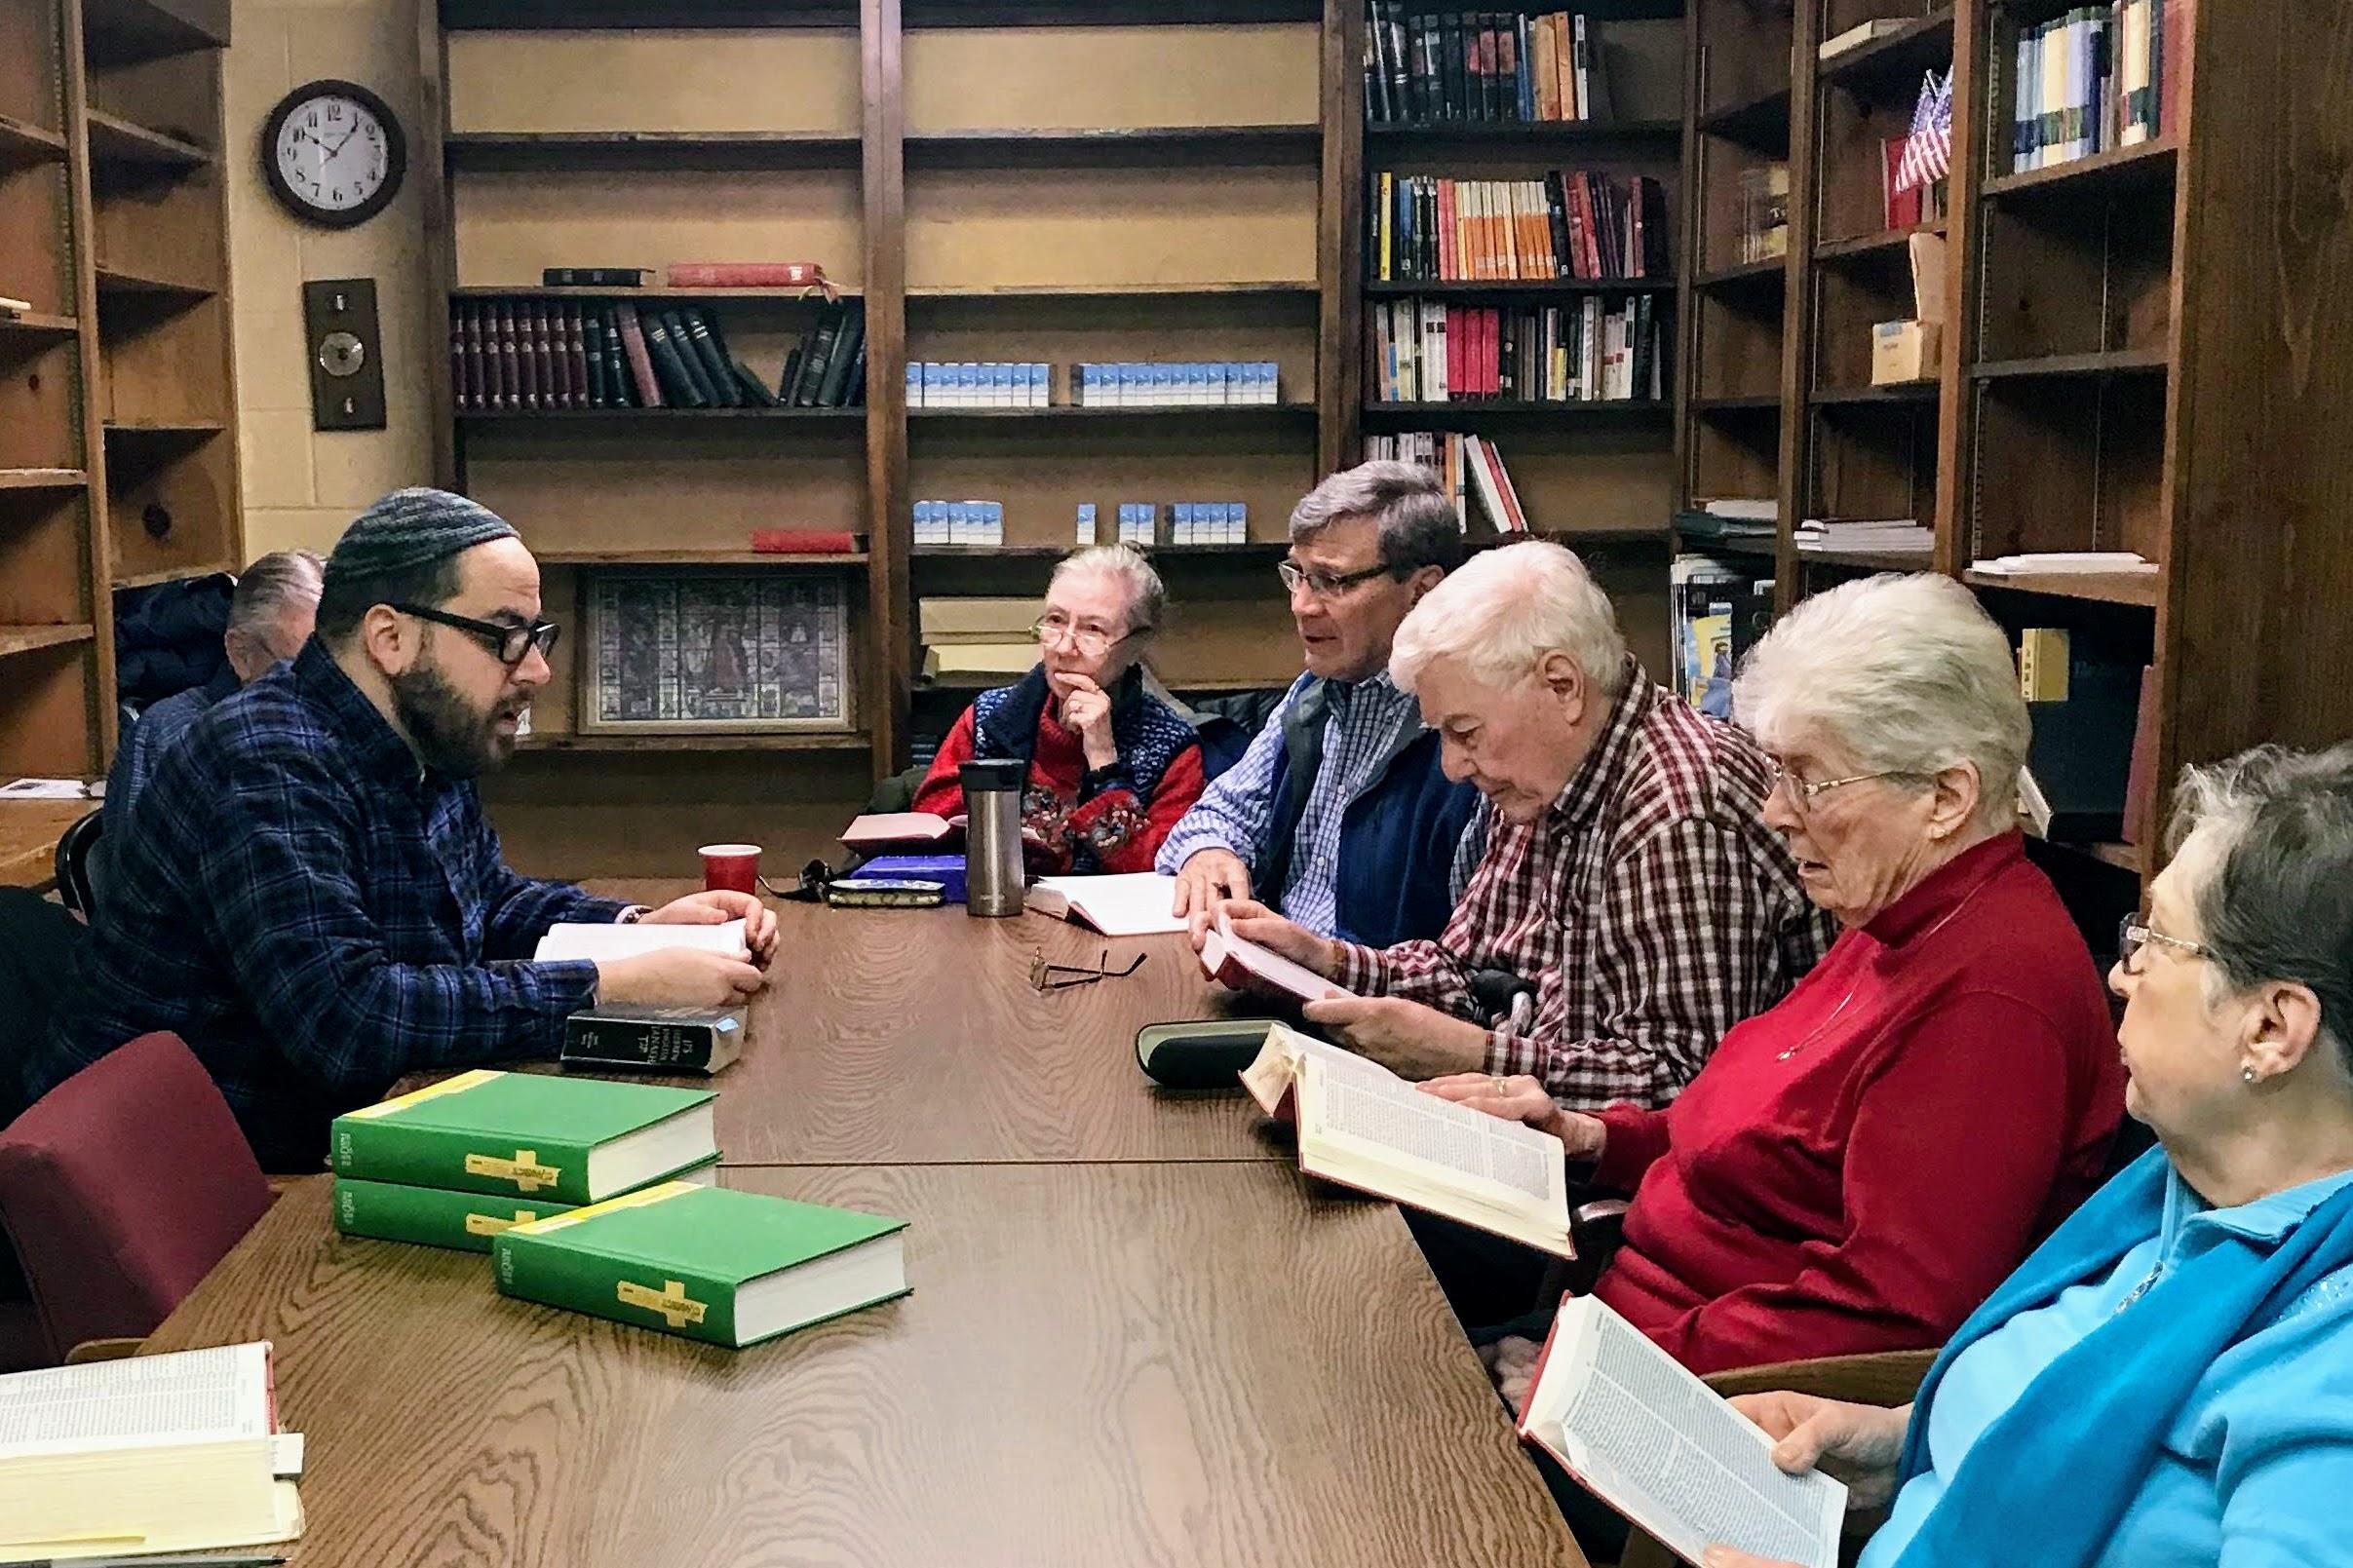 Bible study with Rabbi Wajnberg of Temple Beth Rishon